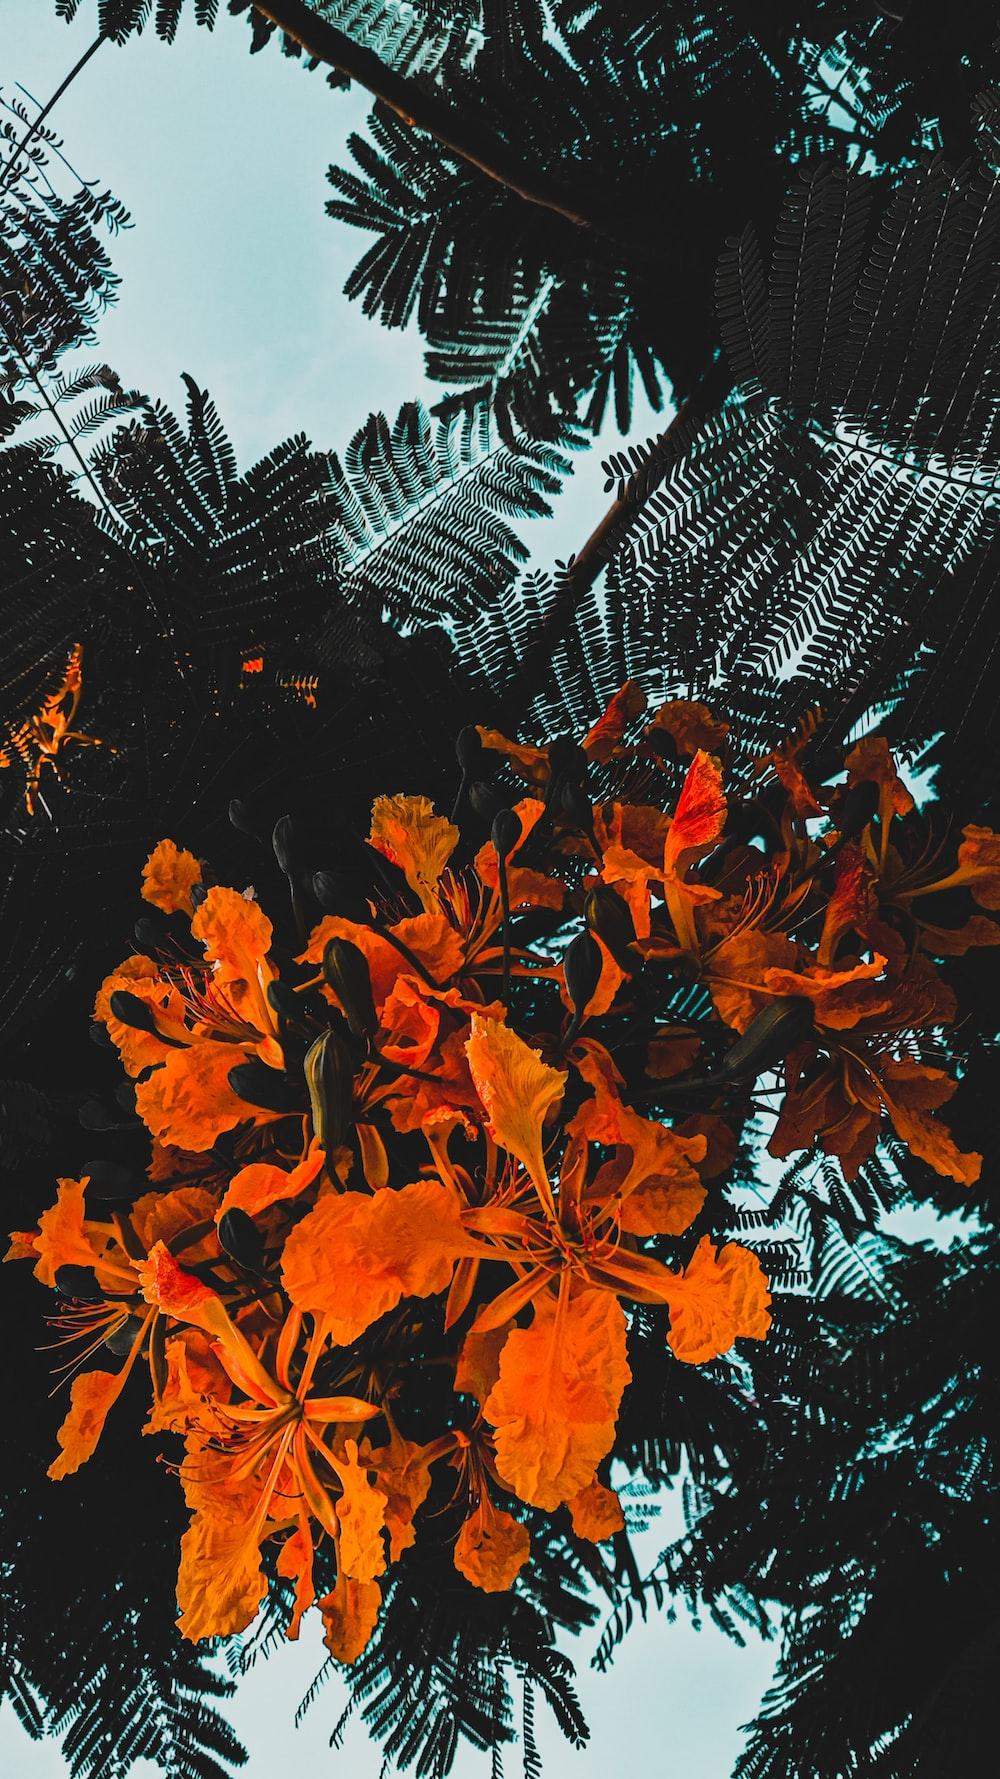 orange maple leaves on white and black net